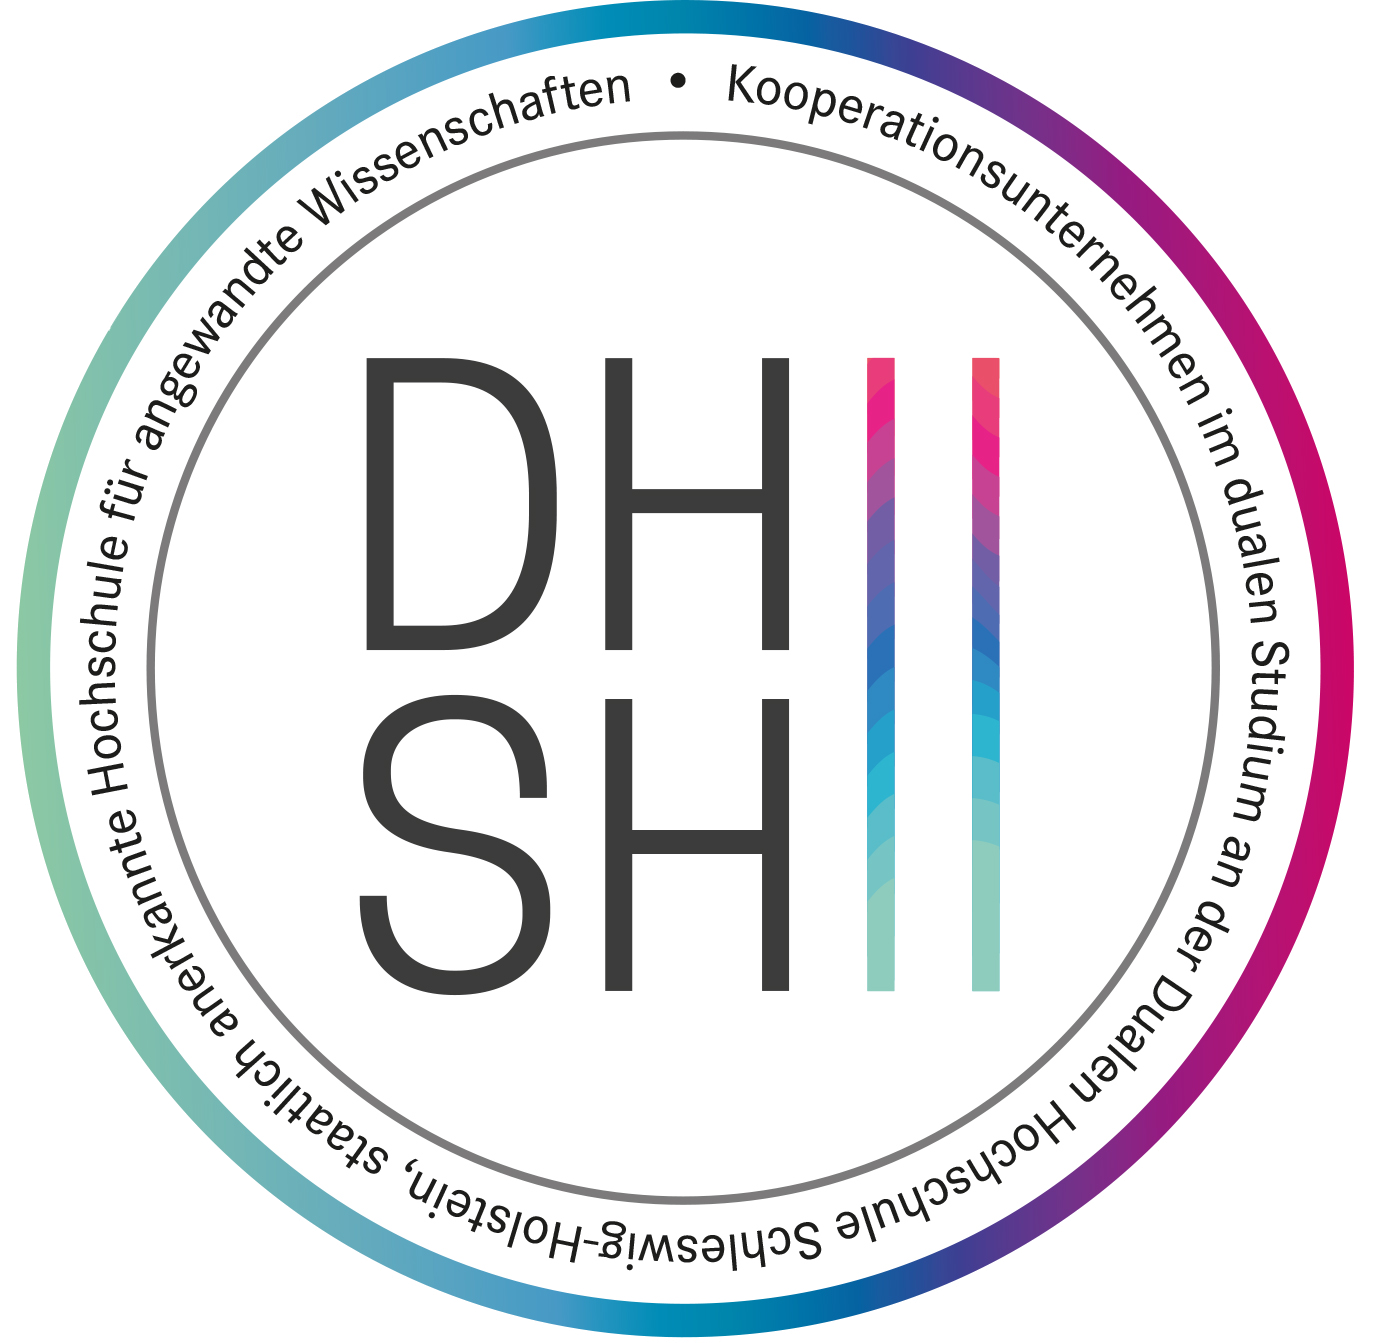 PartnerSignet DHSH